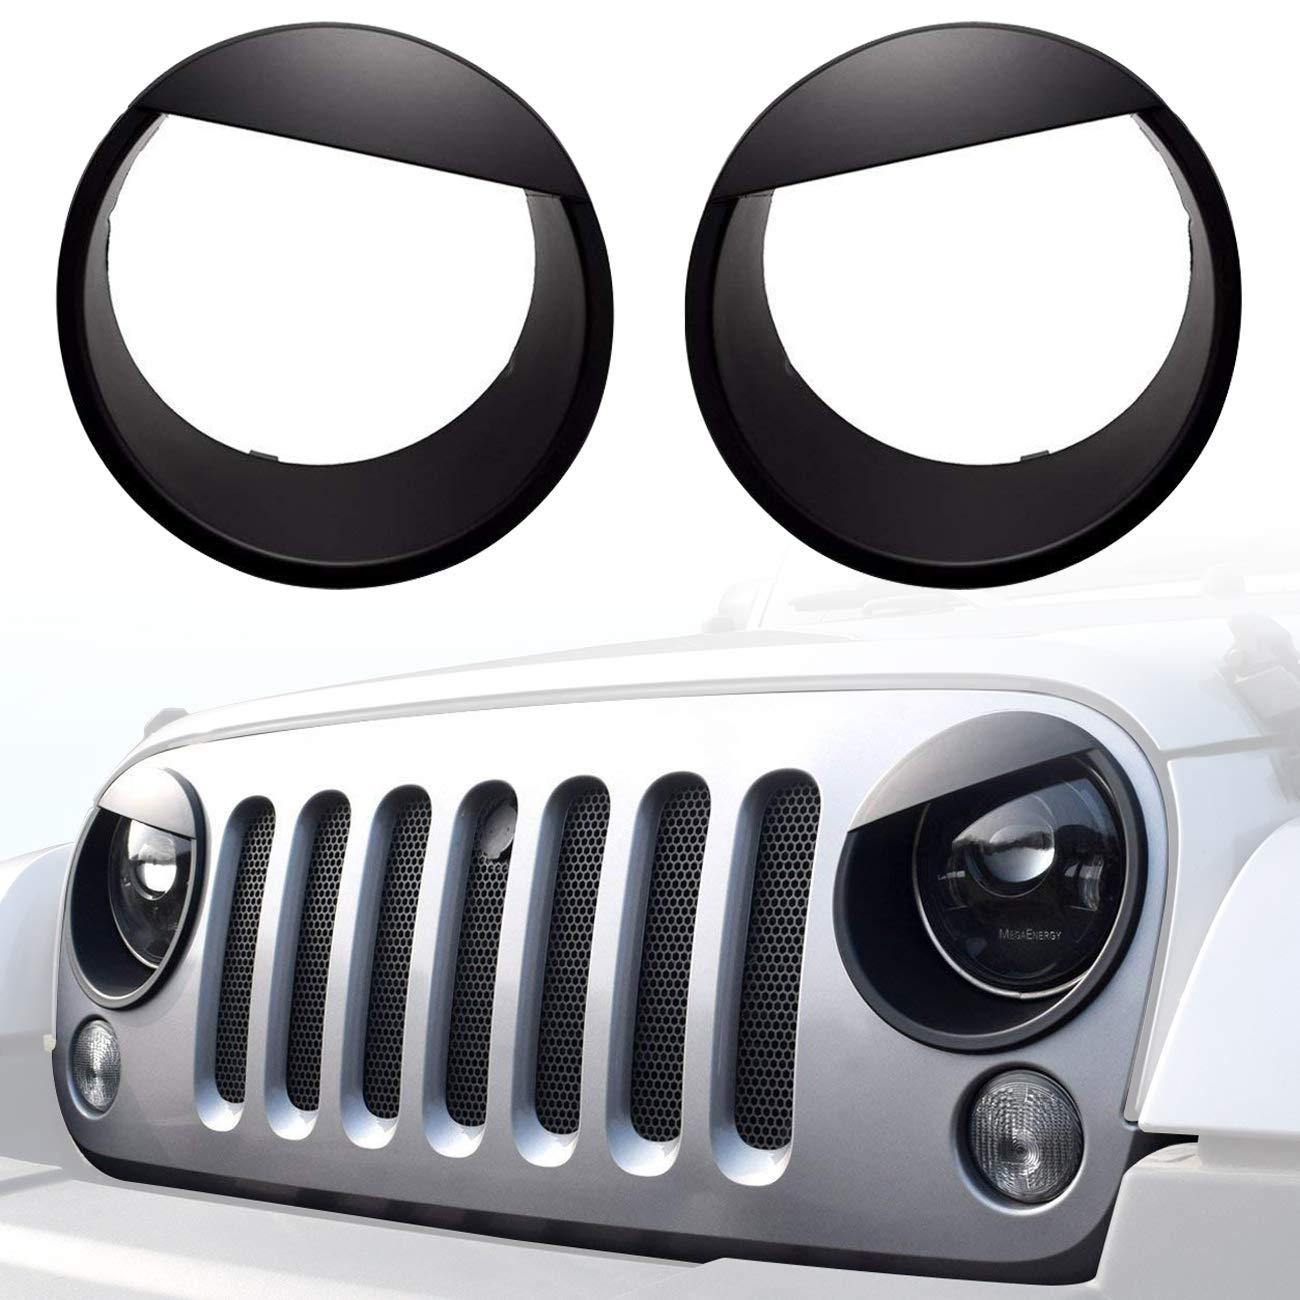 DIYTuning Angry Eyes Front Lights Trim Cover Headlight Bezels for Jeep Wrangler JK JKU Unlimited Rubicon Sahara Sport 2007-2017 DIYMaker